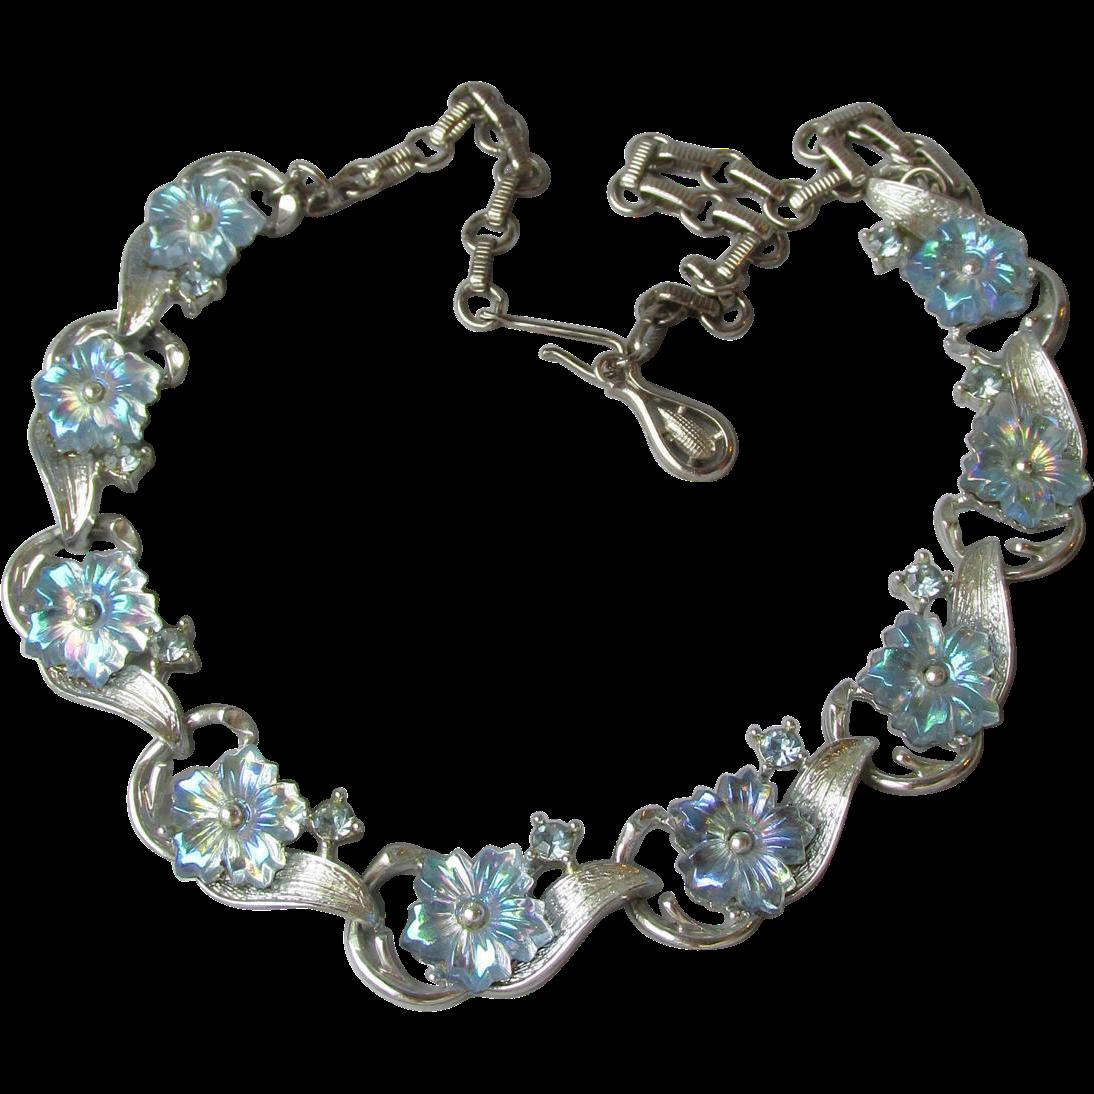 Vintage Coro Necklace with Blue Aurora Borealis Molded Flower Rhinestones